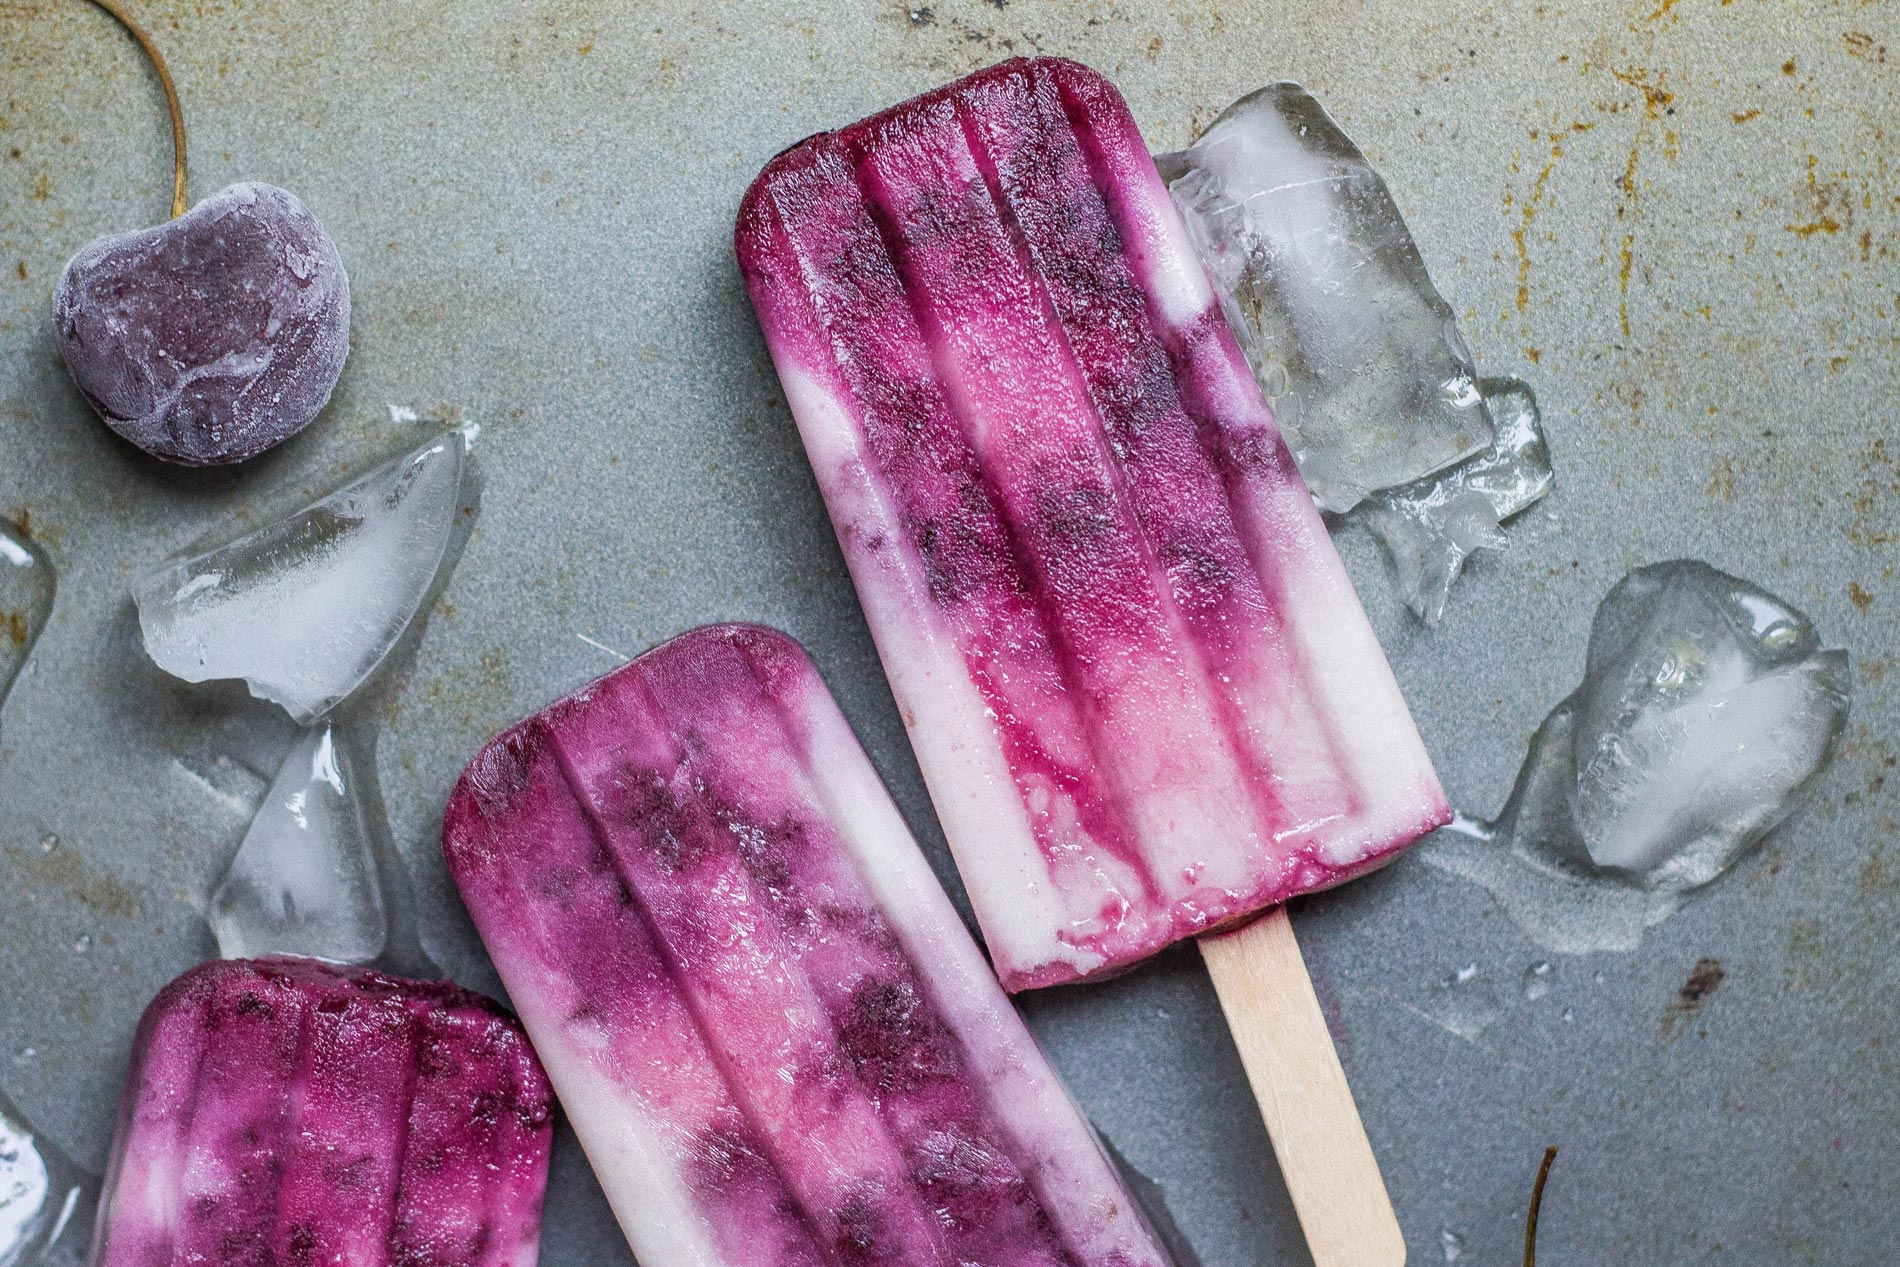 37 utensilios de cocina para agenciarte este verano